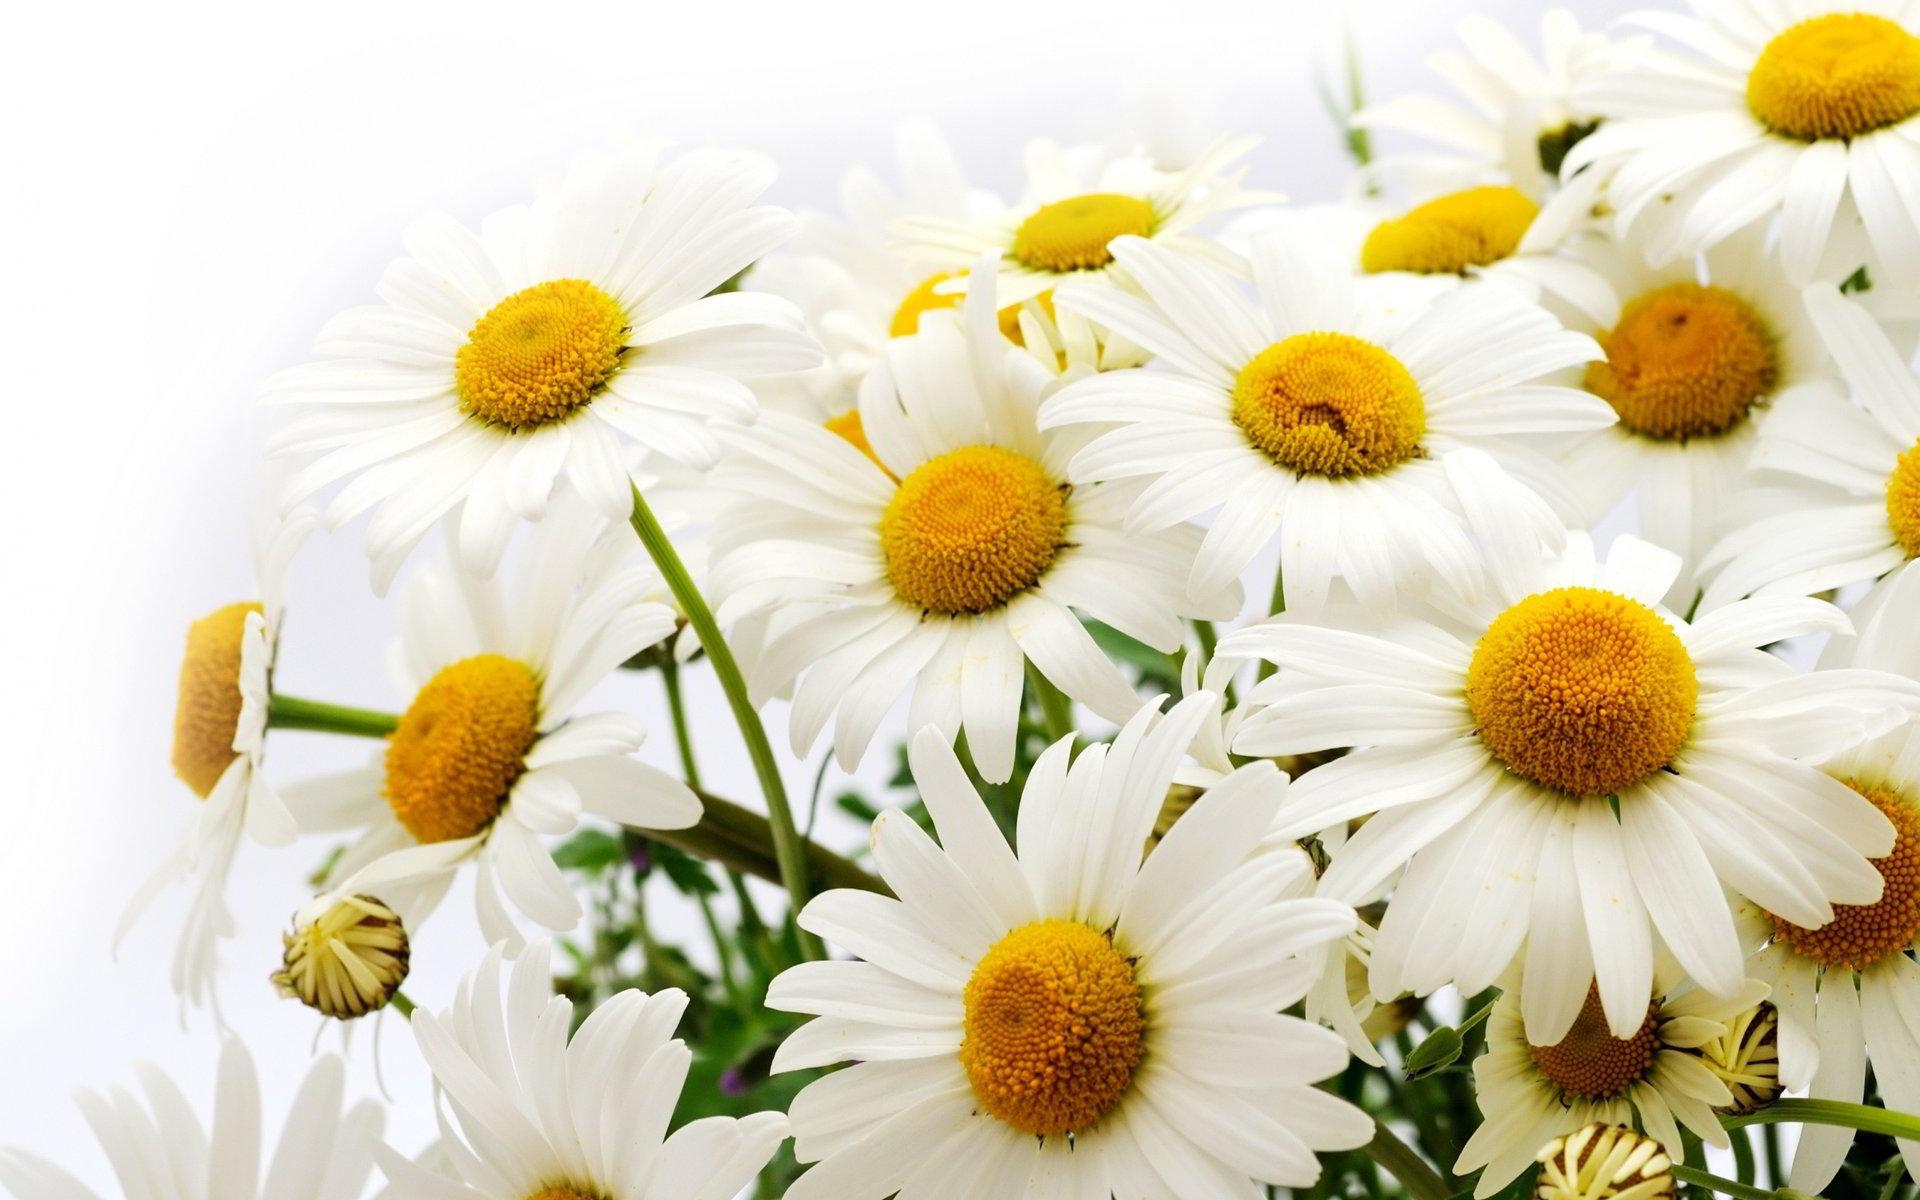 hinh anh hoa cuc dep 27